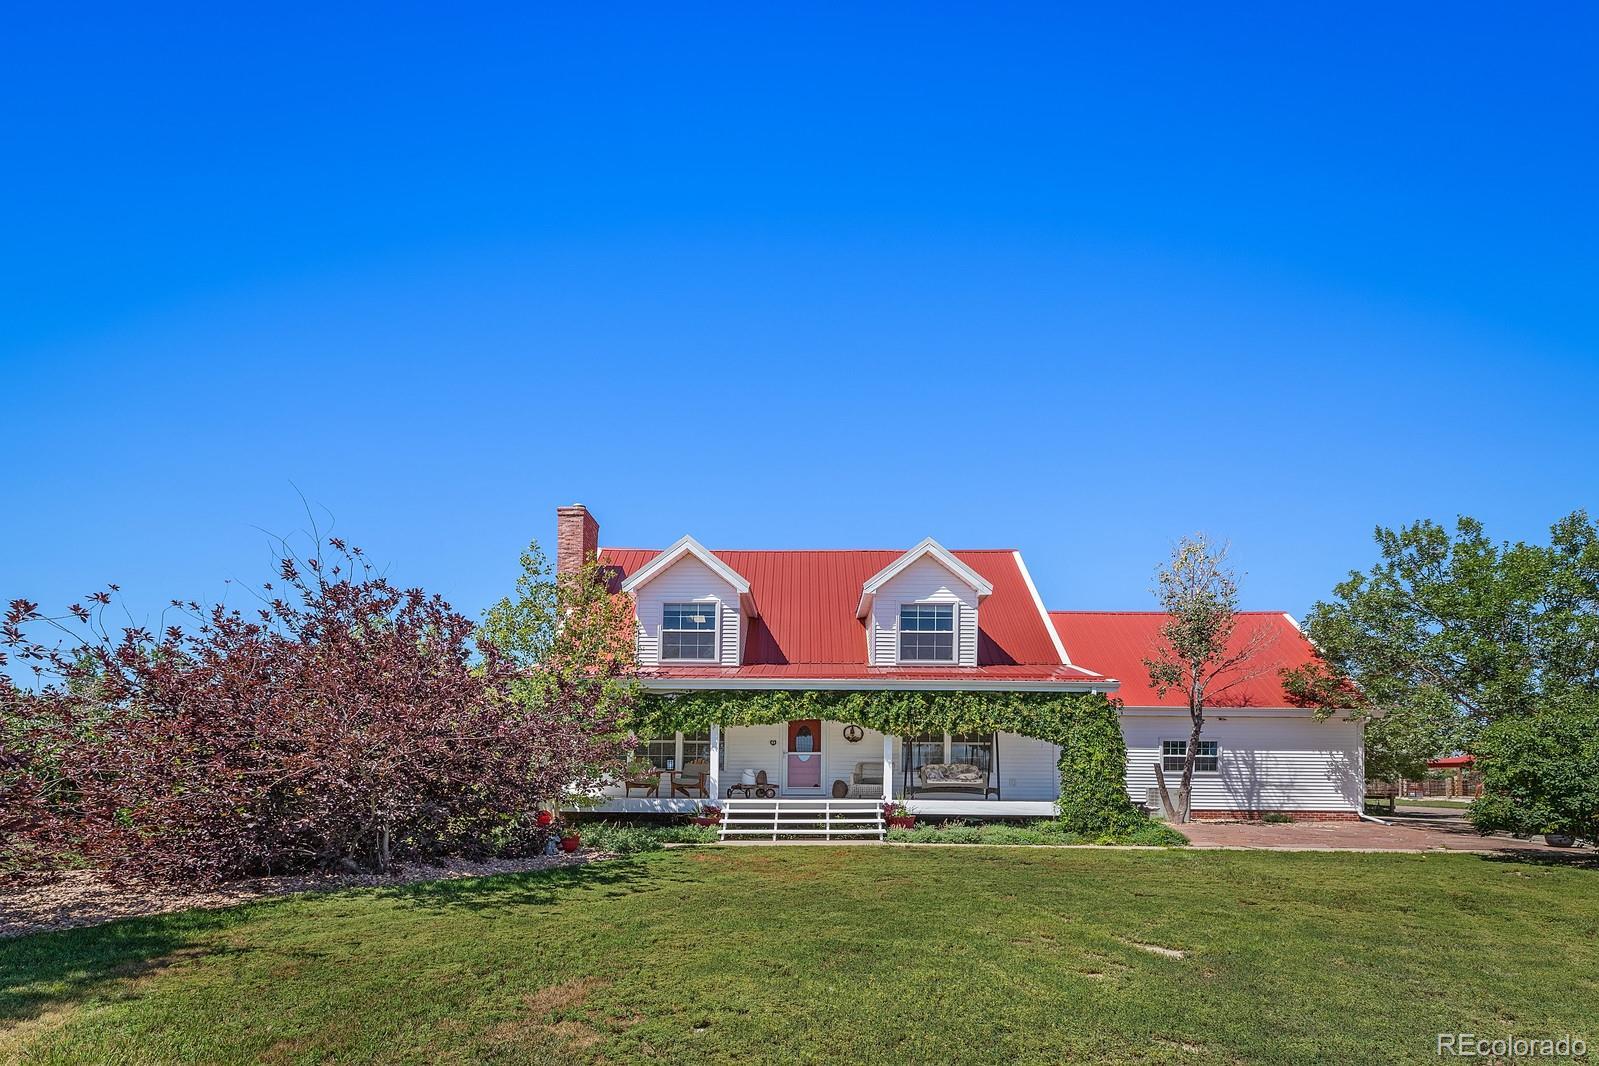 6449 County Road 63, Keenesburg, CO 80643 - Keenesburg, CO real estate listing